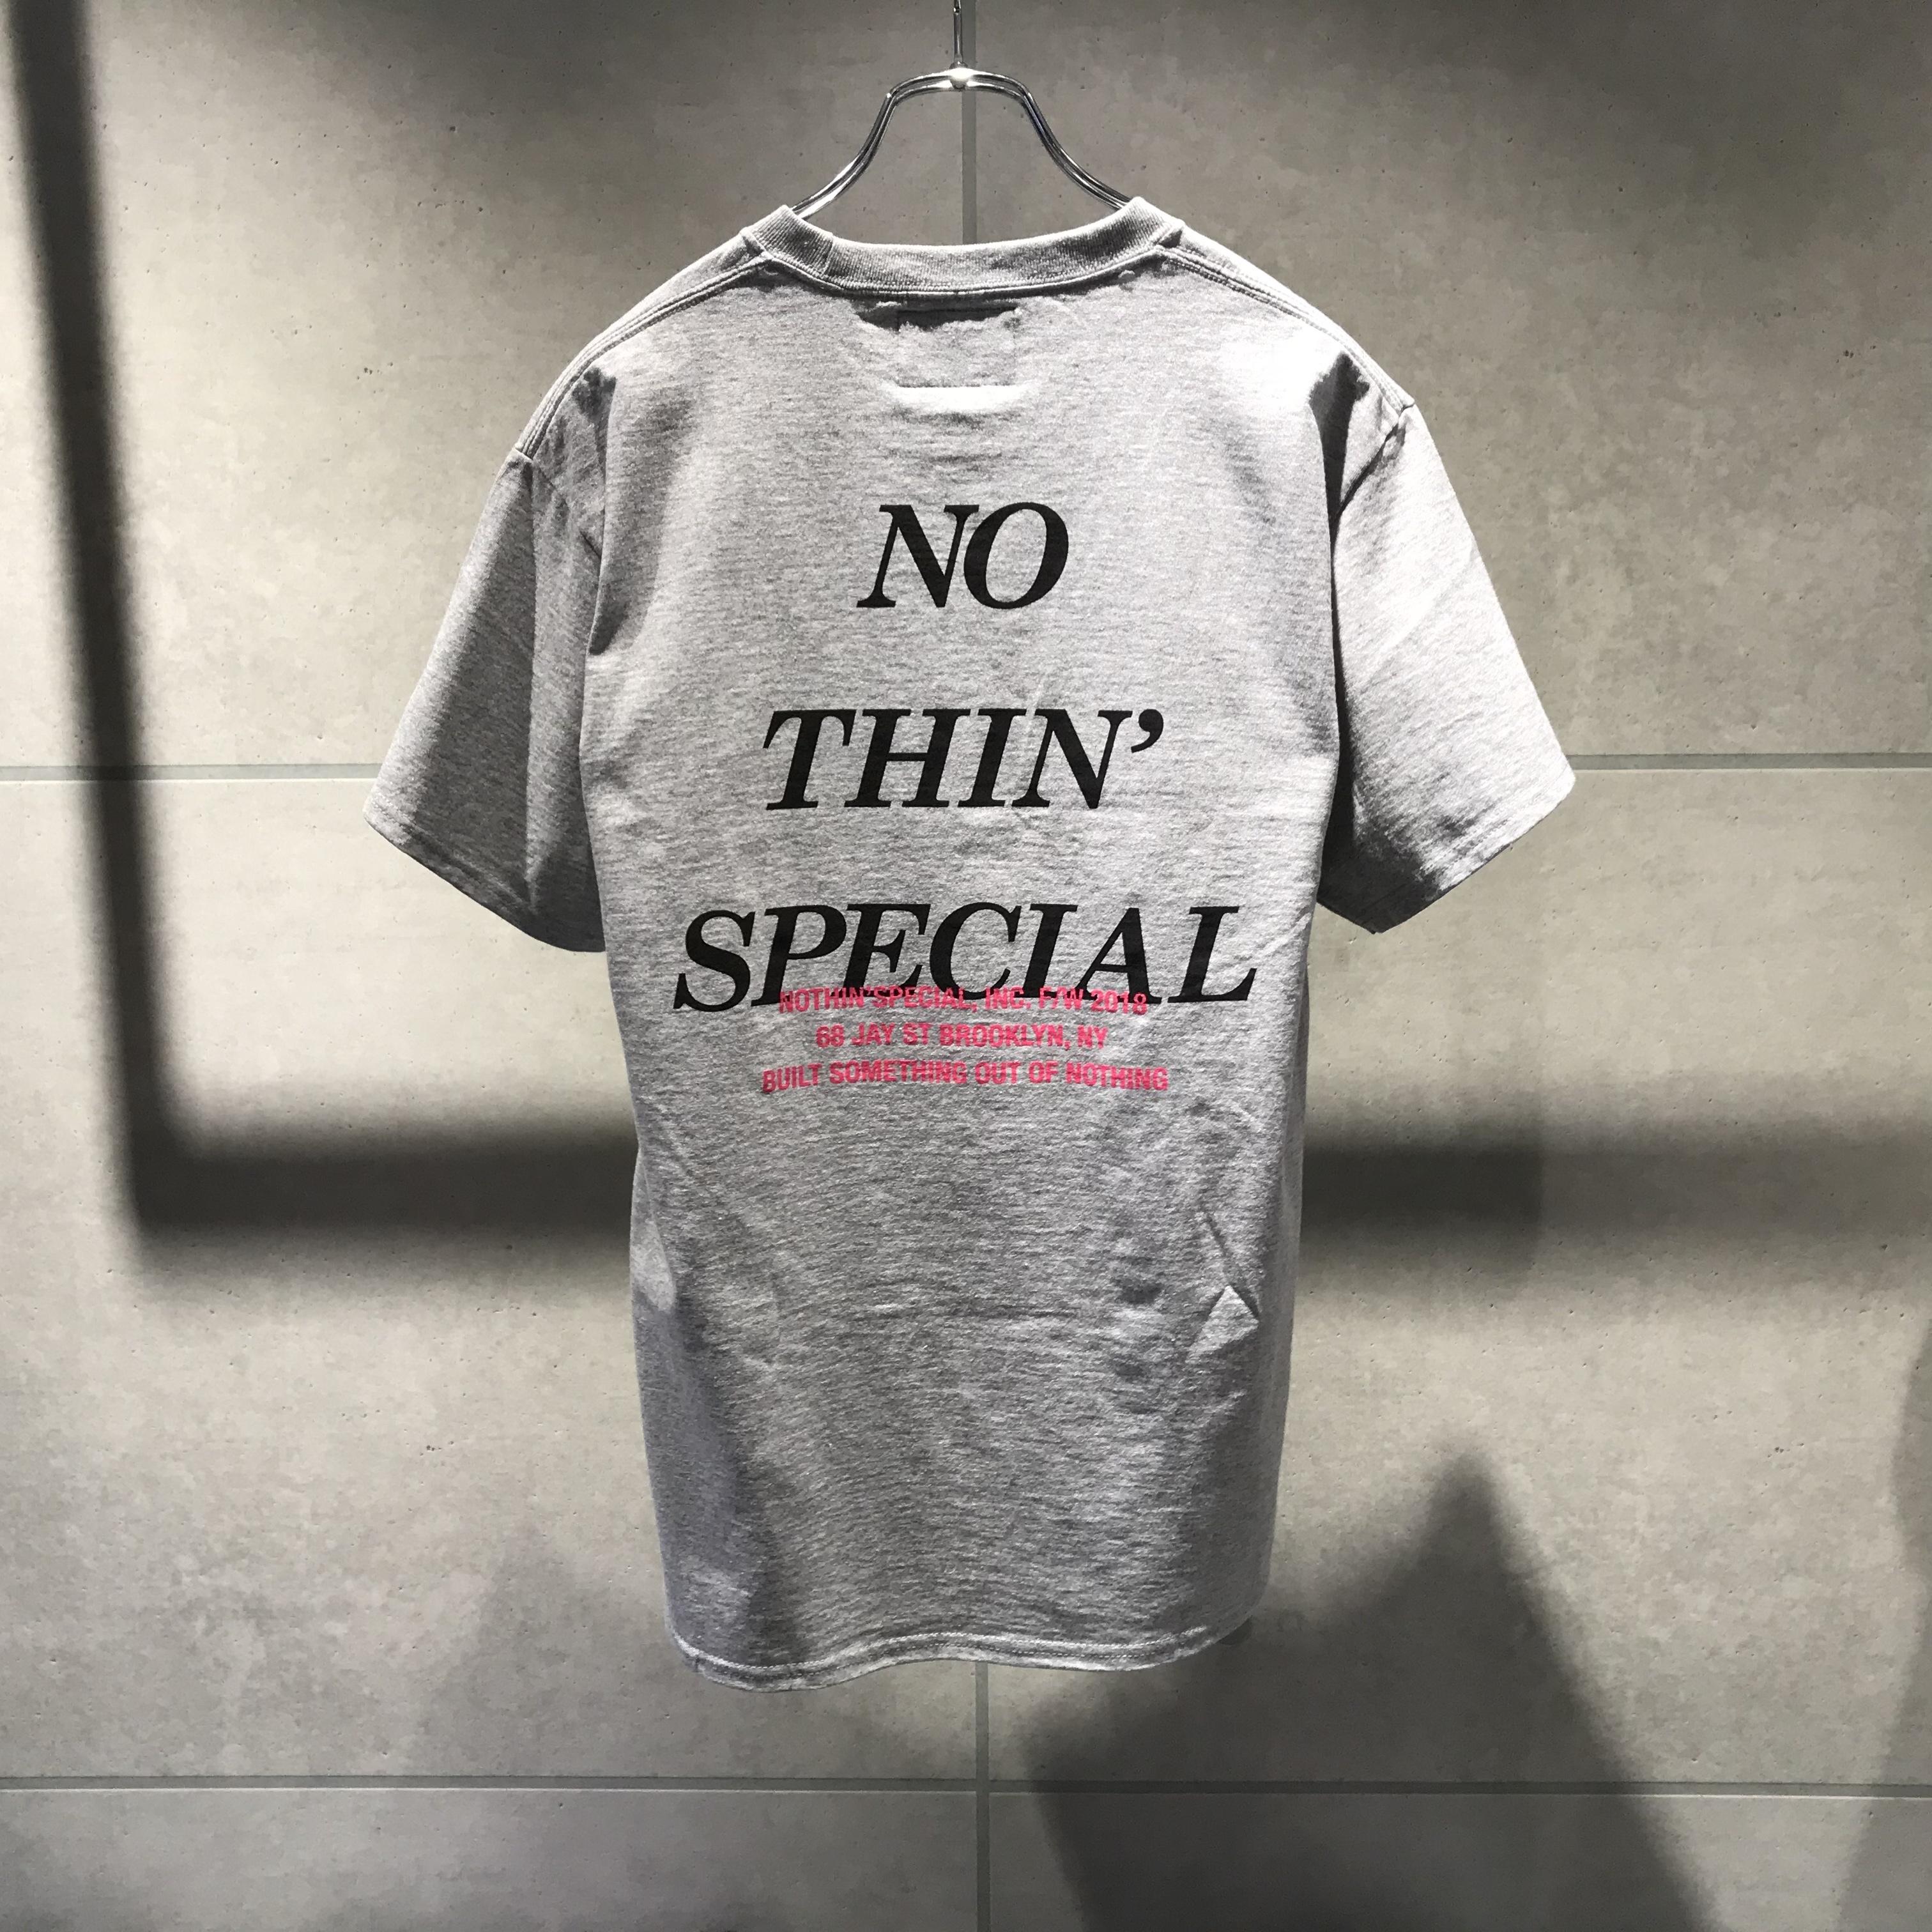 NOTHIN'SPECIAL FW 2018 LOGO TEE / HEATHER GRAY x BLACK